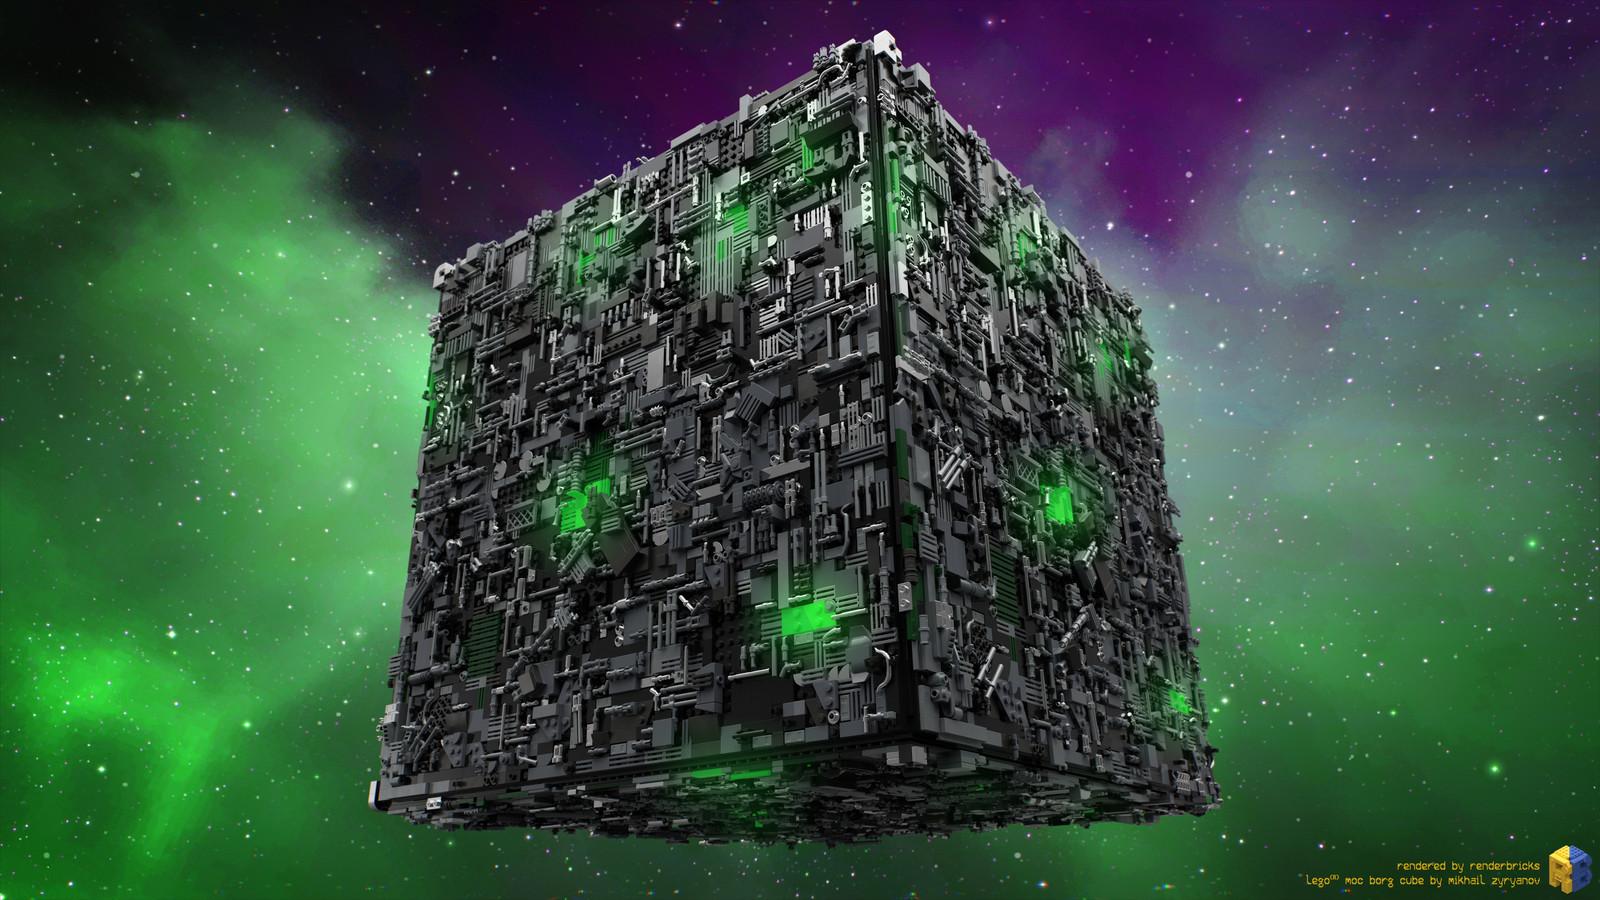 renderbricks-rb0108-borg-cube-v06-cama-8k-by-mikhail-zyryanov.jpg?1511660175